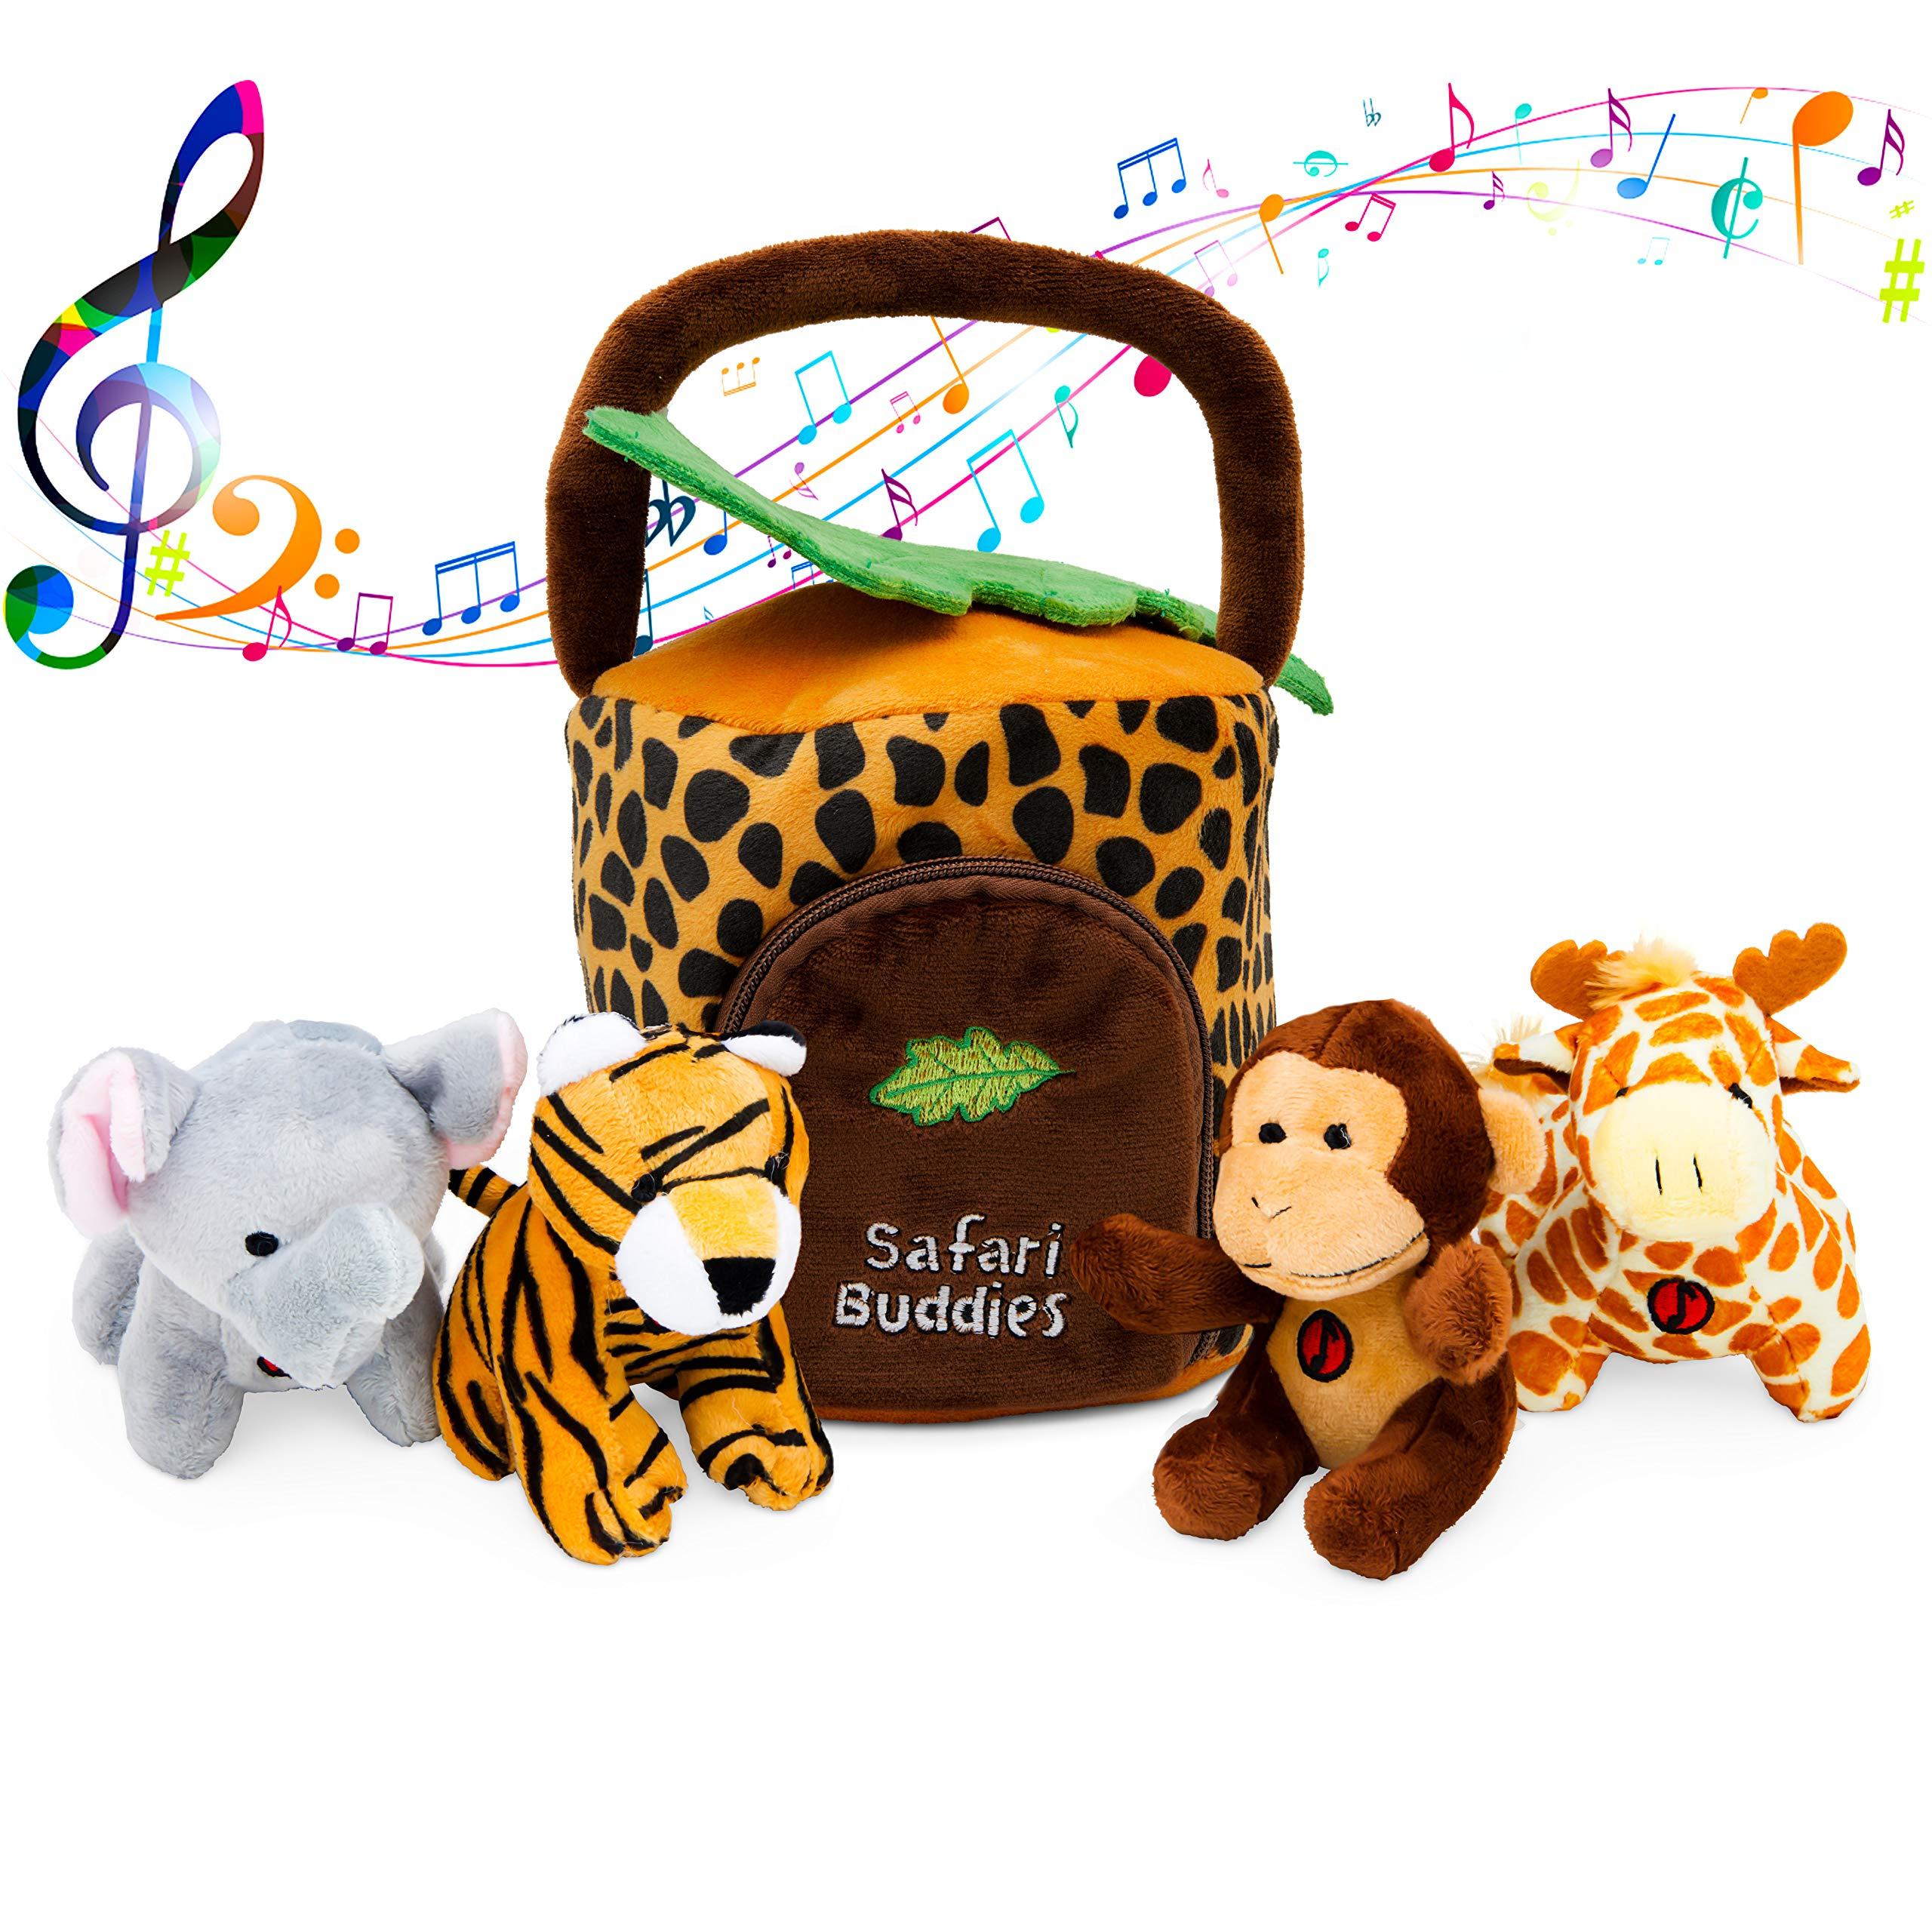 Plush Talking Jungle Animals Toy Set Plush Creations (5 Pcs) | Baby Stuffed Animal Set Includes Elephant, Monkey, Giraffe, Tiger Plush Carrier/Organizer | Great Gift Boys, Girls, Baby Shower by Plush Creations